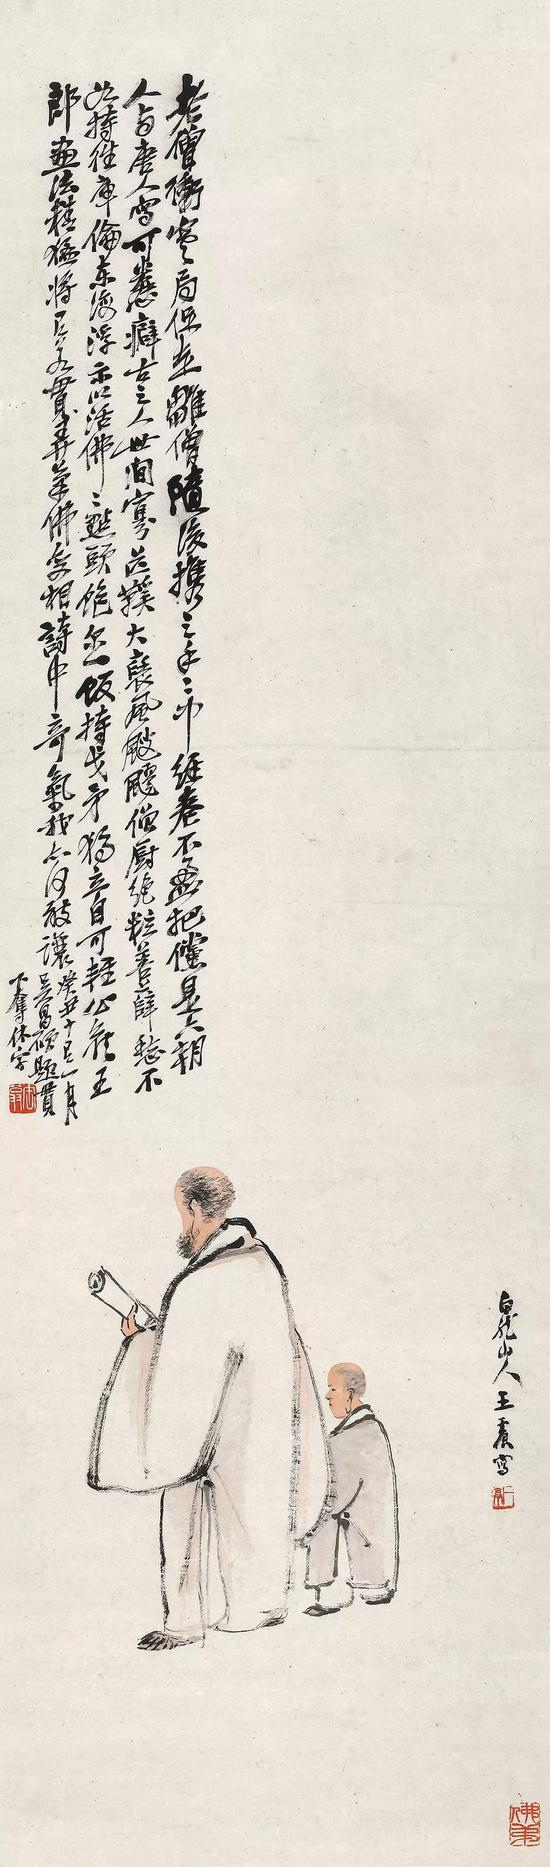 Lot 318 王震(1867-1938) 传灯